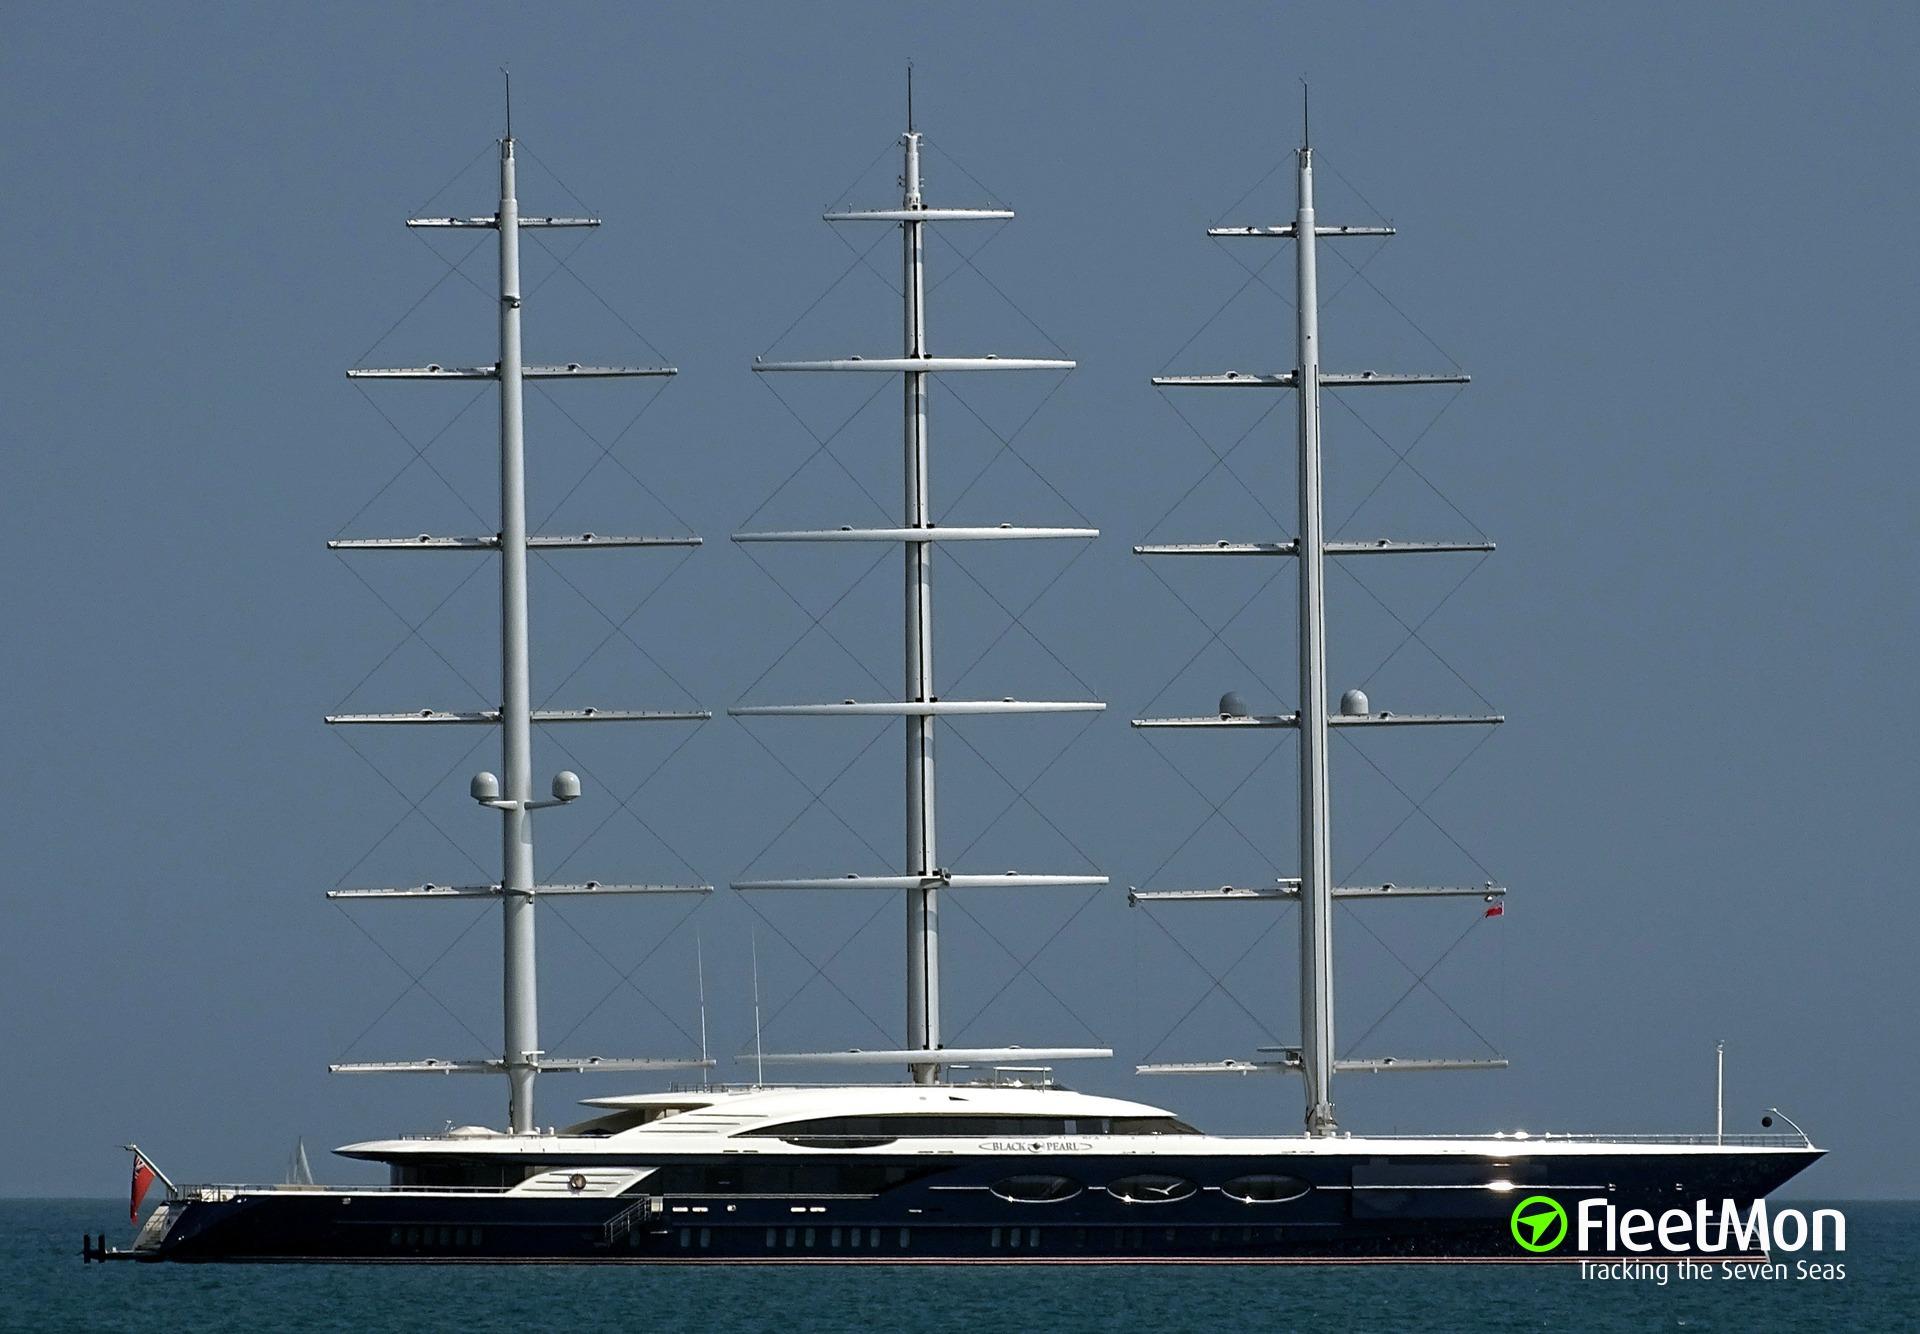 Vessel Black Pearl (Sailing ship) IMO 1012490, MMSI 319113100